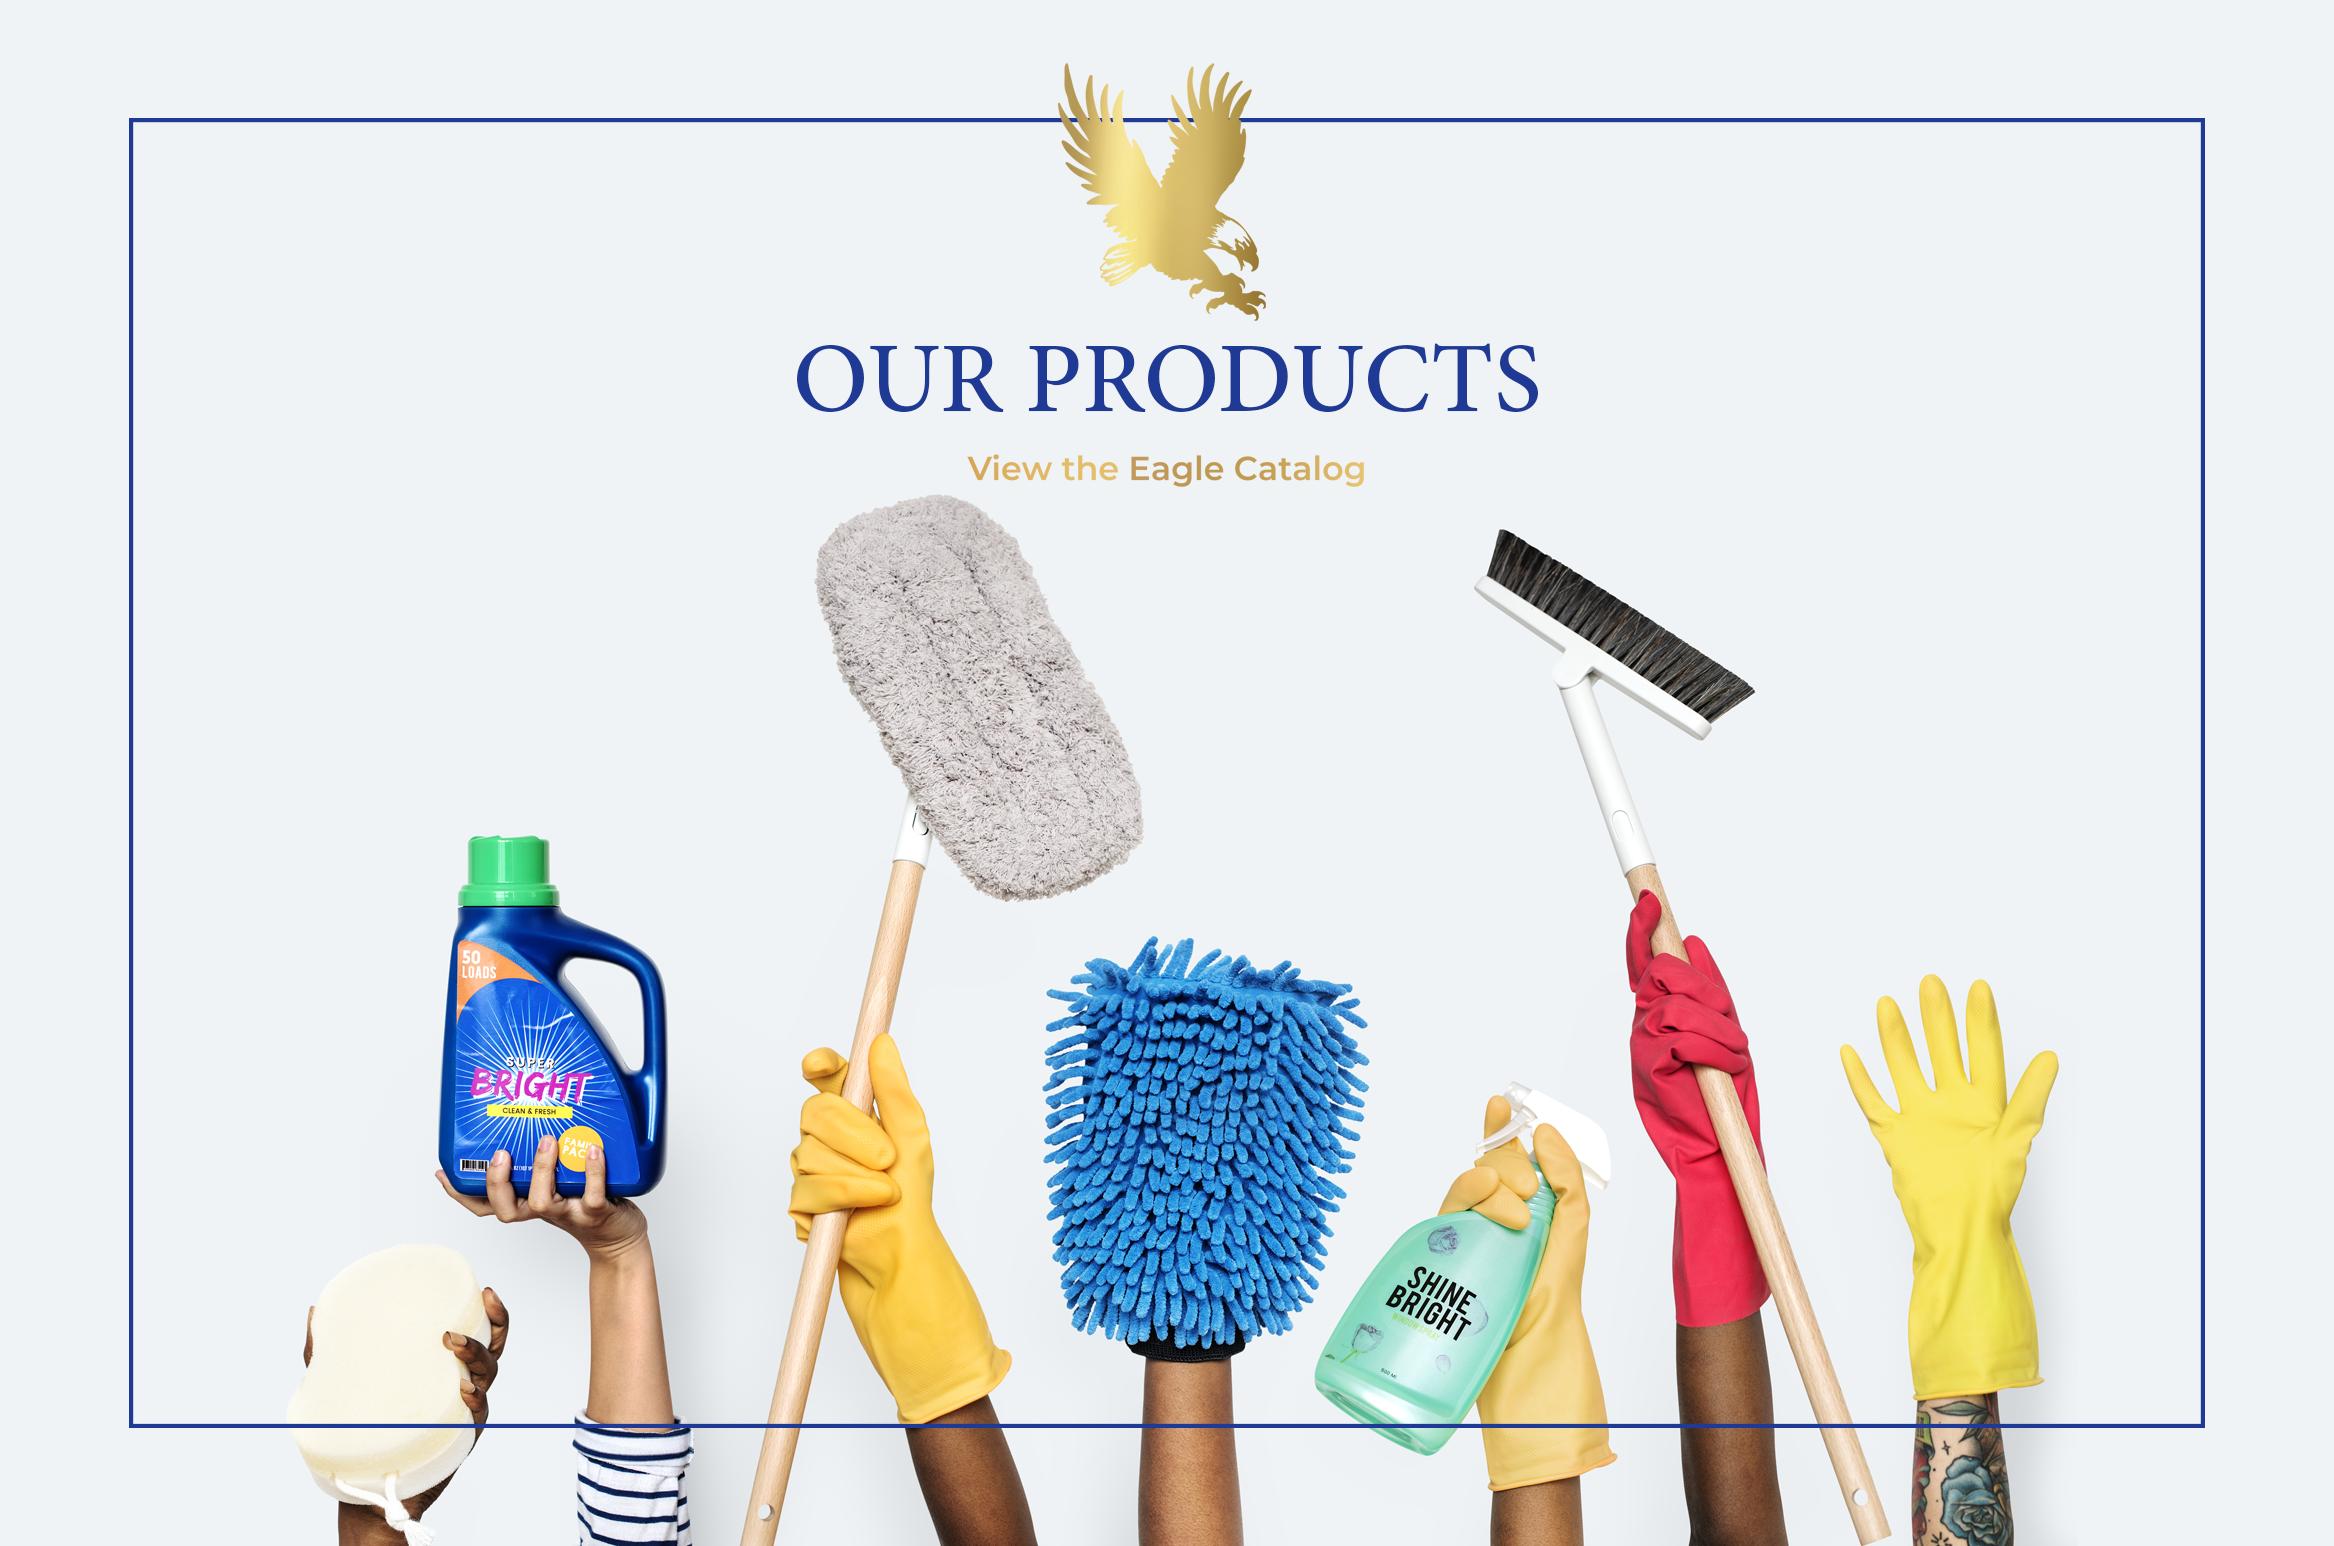 Eagle Brush & Chemical